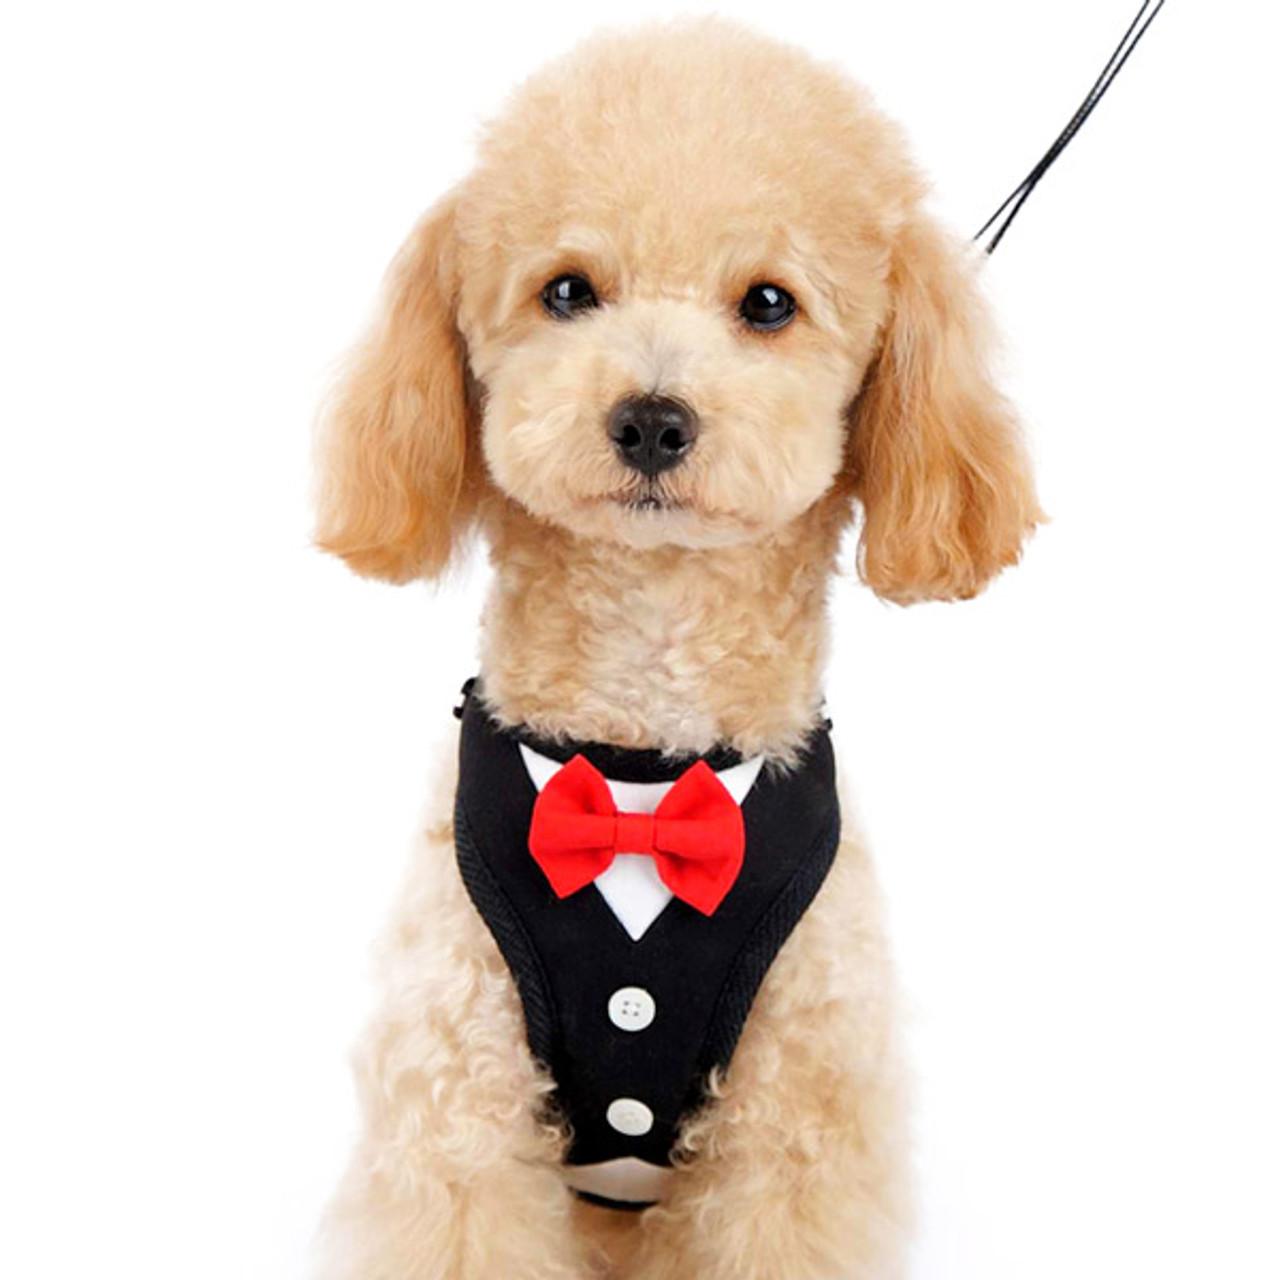 Collar Bows Pet Bows Pet Birthday Pet Gift Medium Size Dog Donut print Medium size Dog Bow Tie Animal Collar Bows Dog Accessories